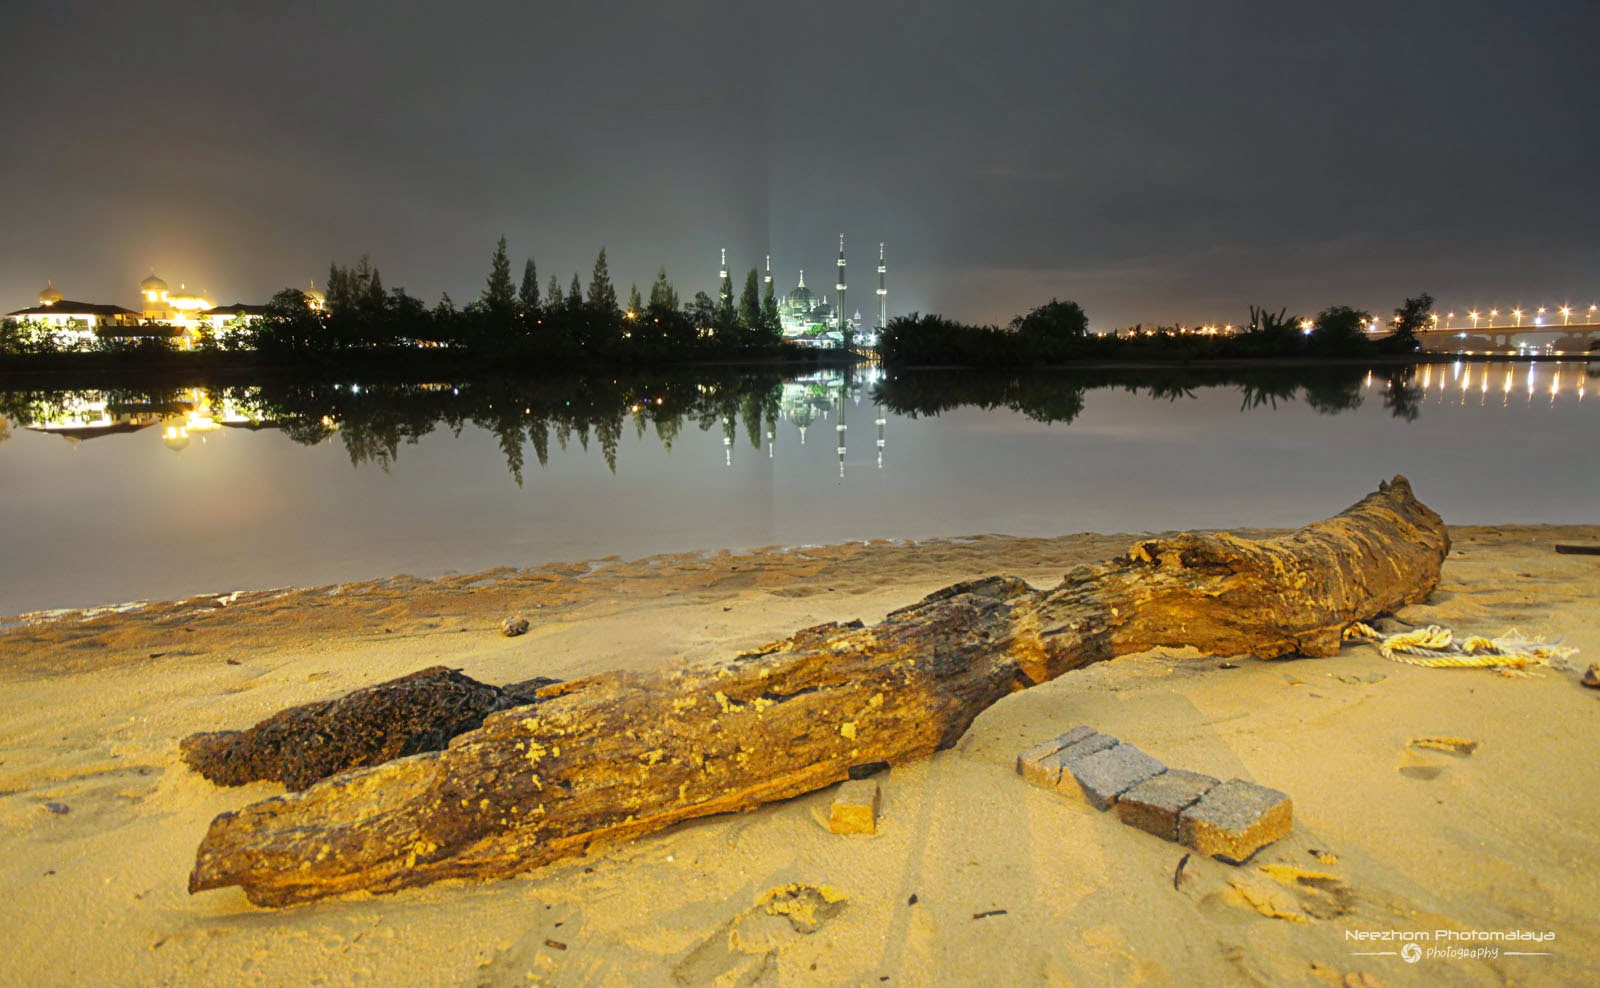 Sungai di Losong waktu malam dengan Masjid Kristal